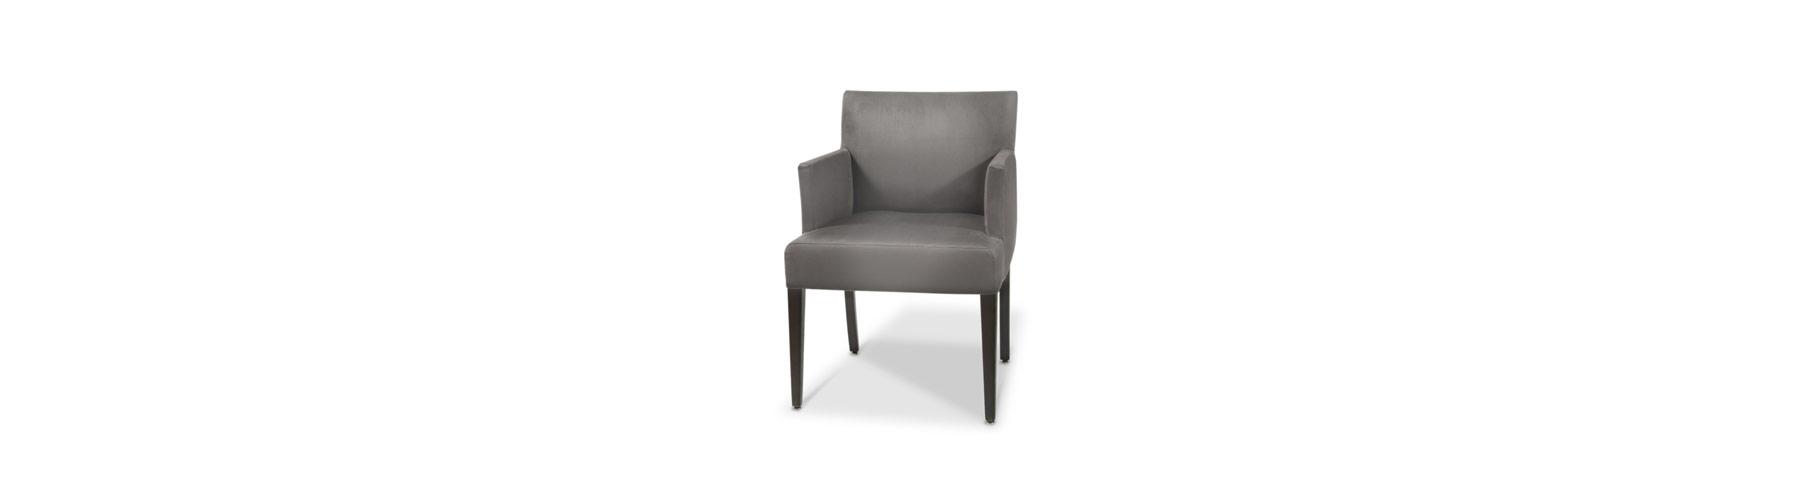 Divine-bras - Chaise William